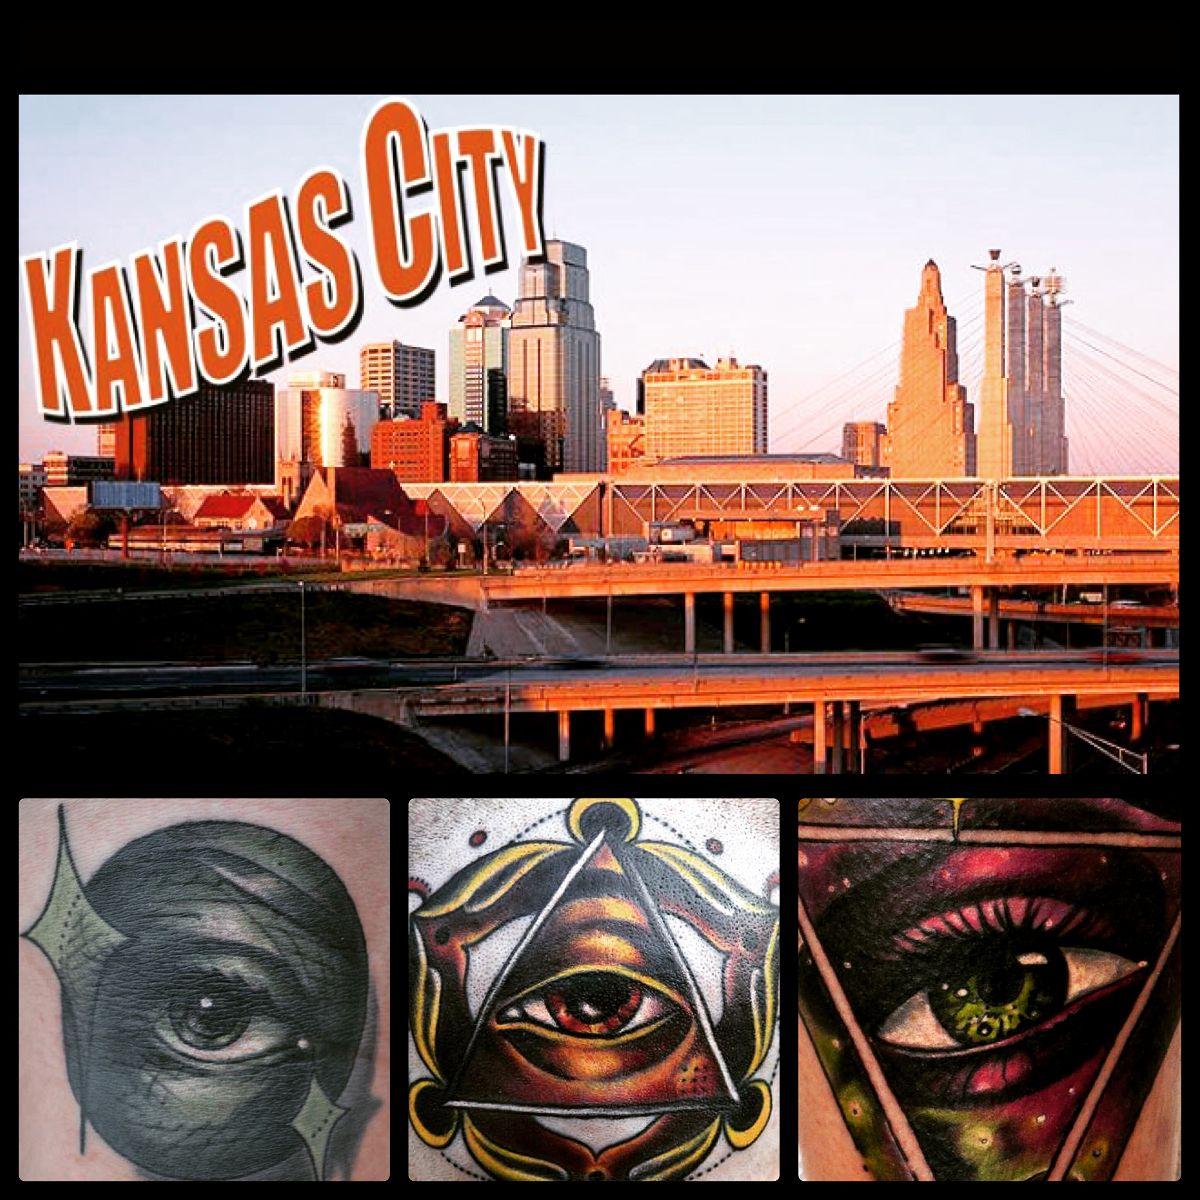 Kansas city tattoo arts convention tattoonow for Tattoo parlors in kansas city